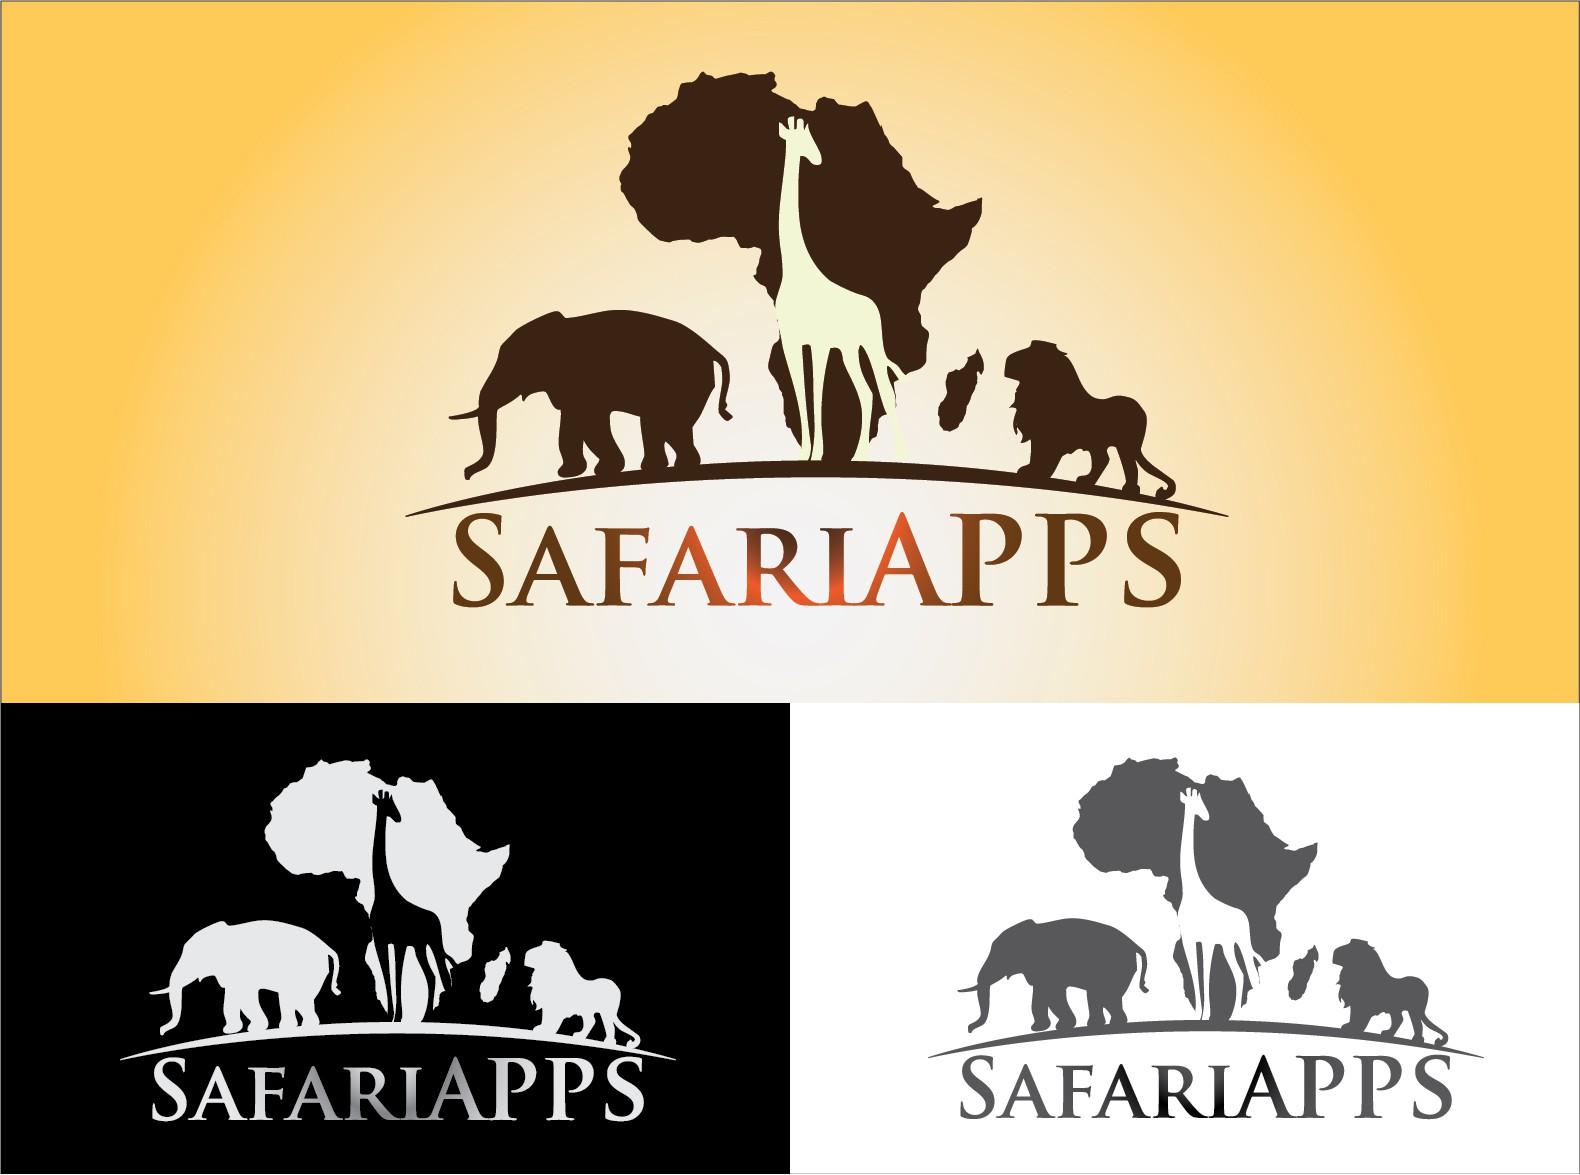 SafariAPPS needs a new logo